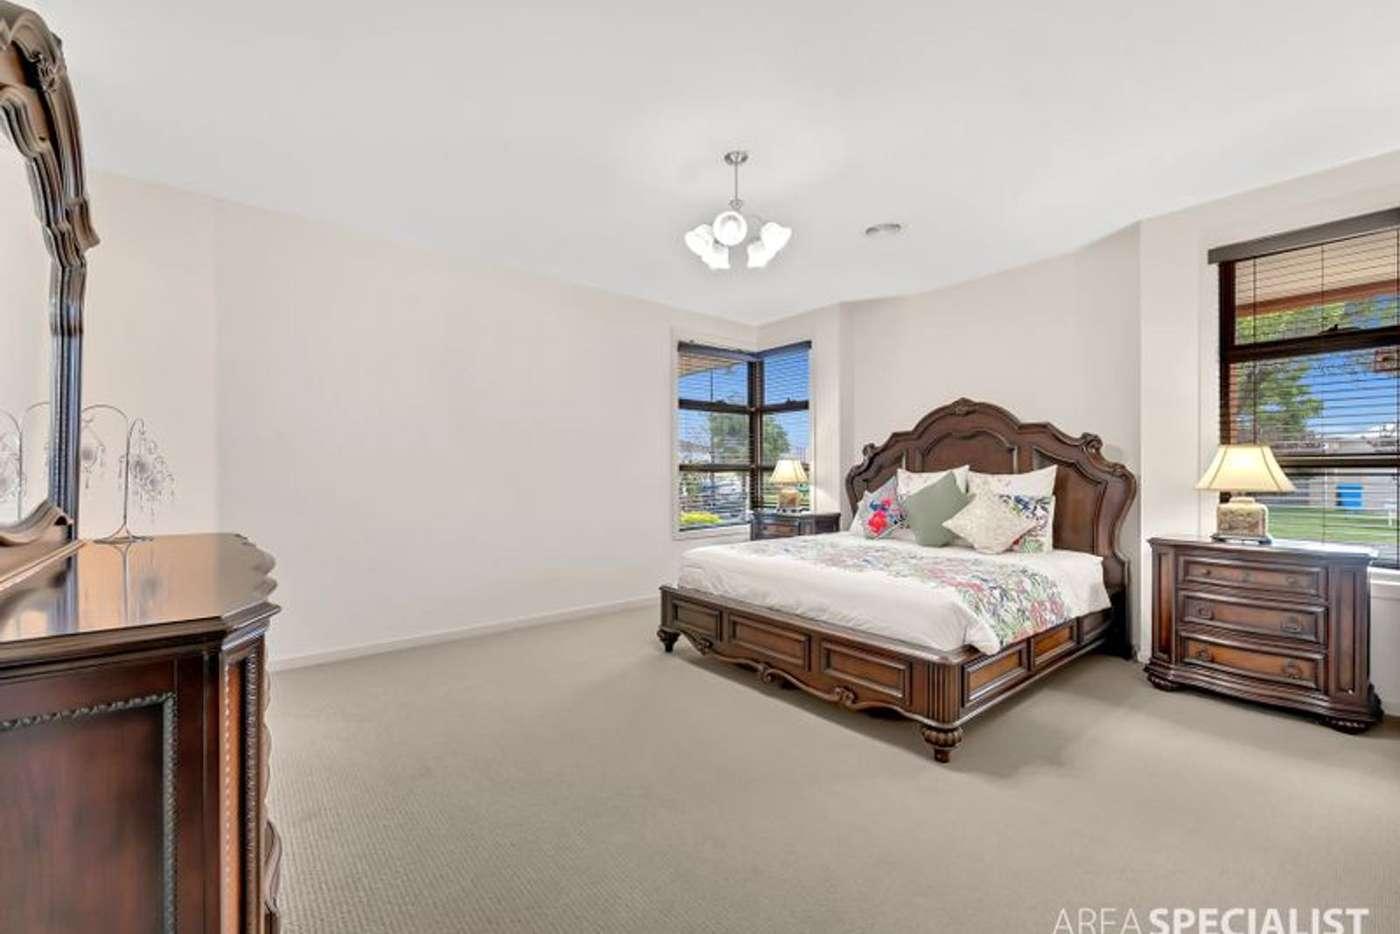 Seventh view of Homely house listing, 15 Mallett Grove, Lyndhurst VIC 3975